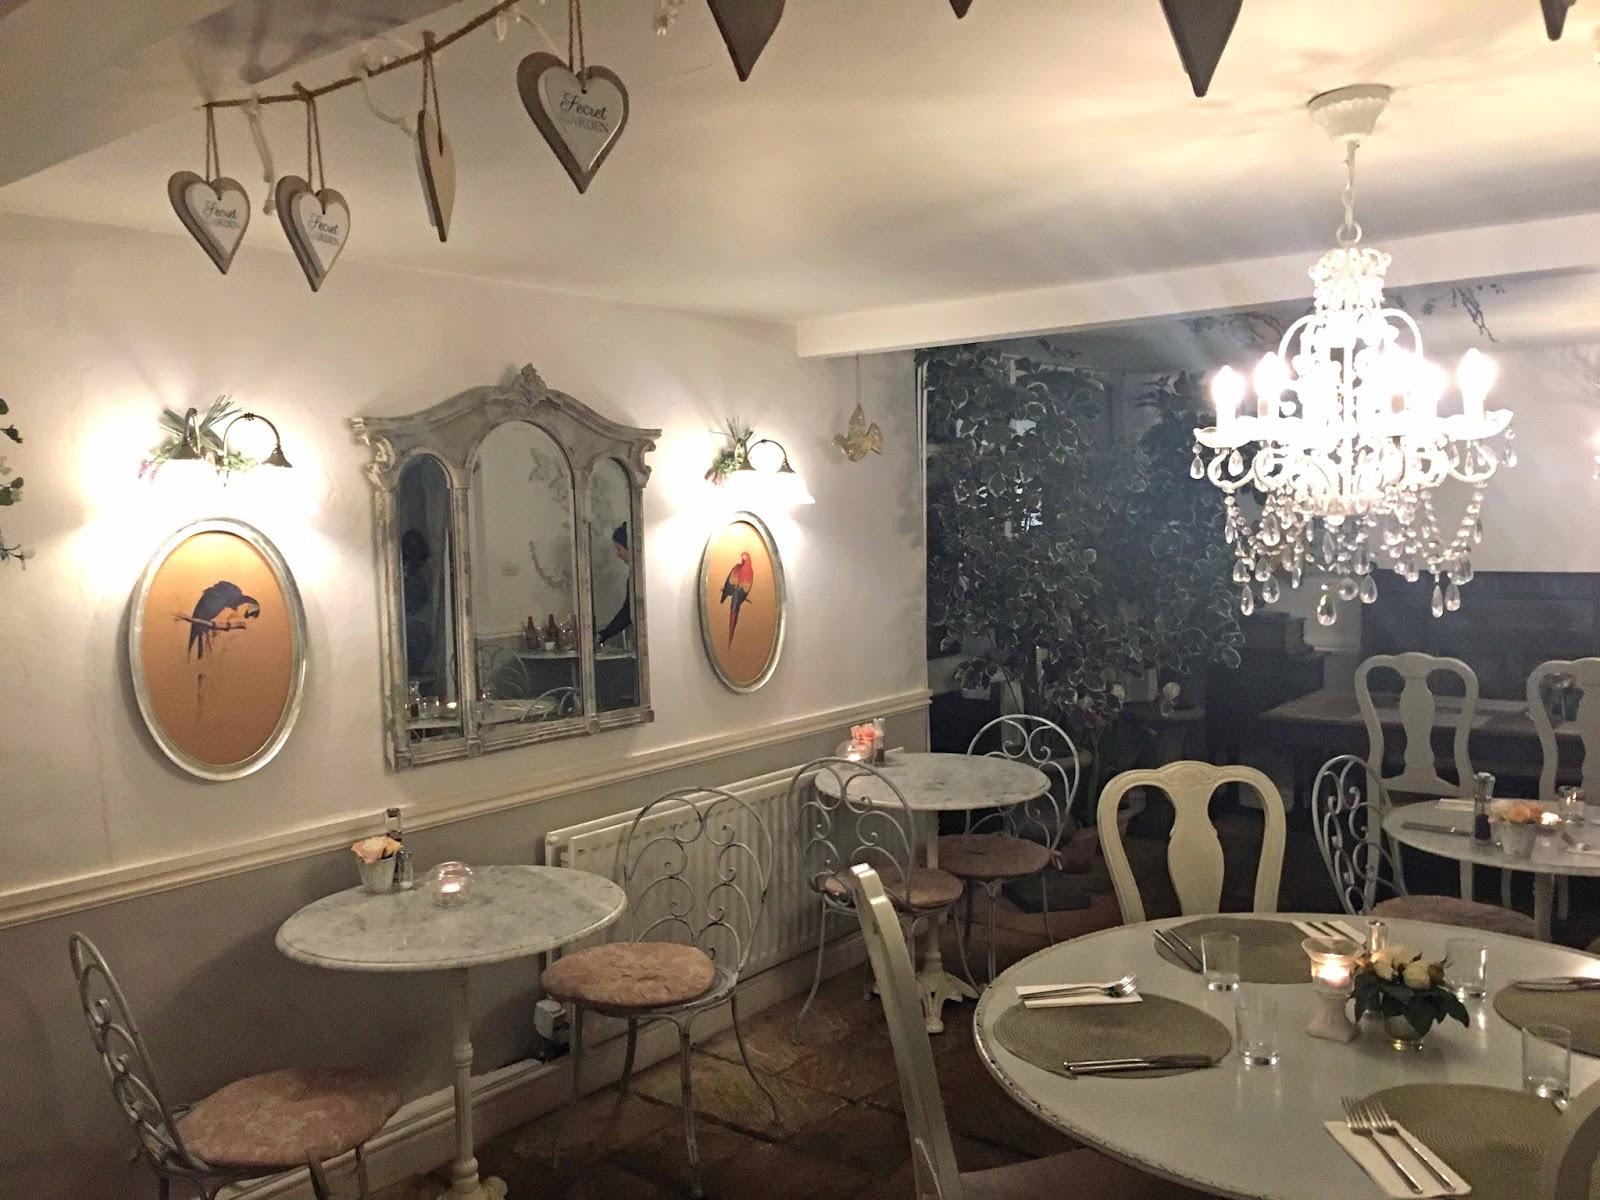 A review of Beck Hall Hotel and Bistro, Malham, Yorkshire Dales. The Secret Garden Bistro, Beck Hall, Malham